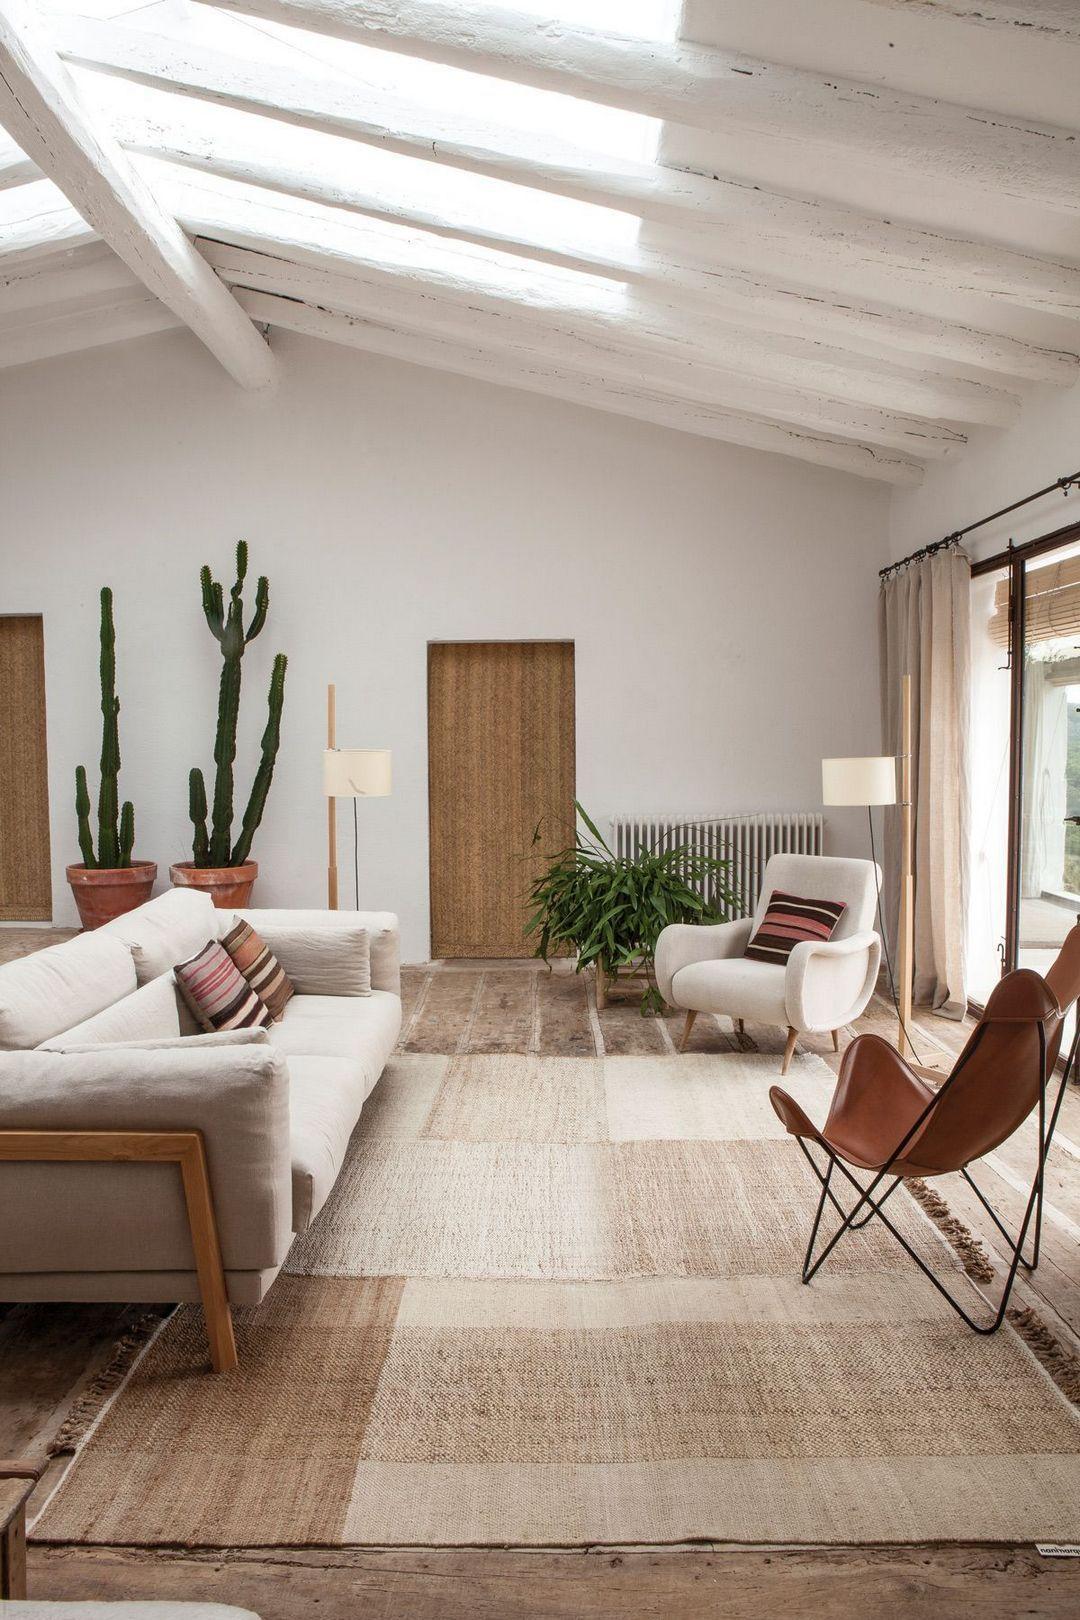 Interior Design Ideas To Thai Style Home Wabi Sabi 47 Living